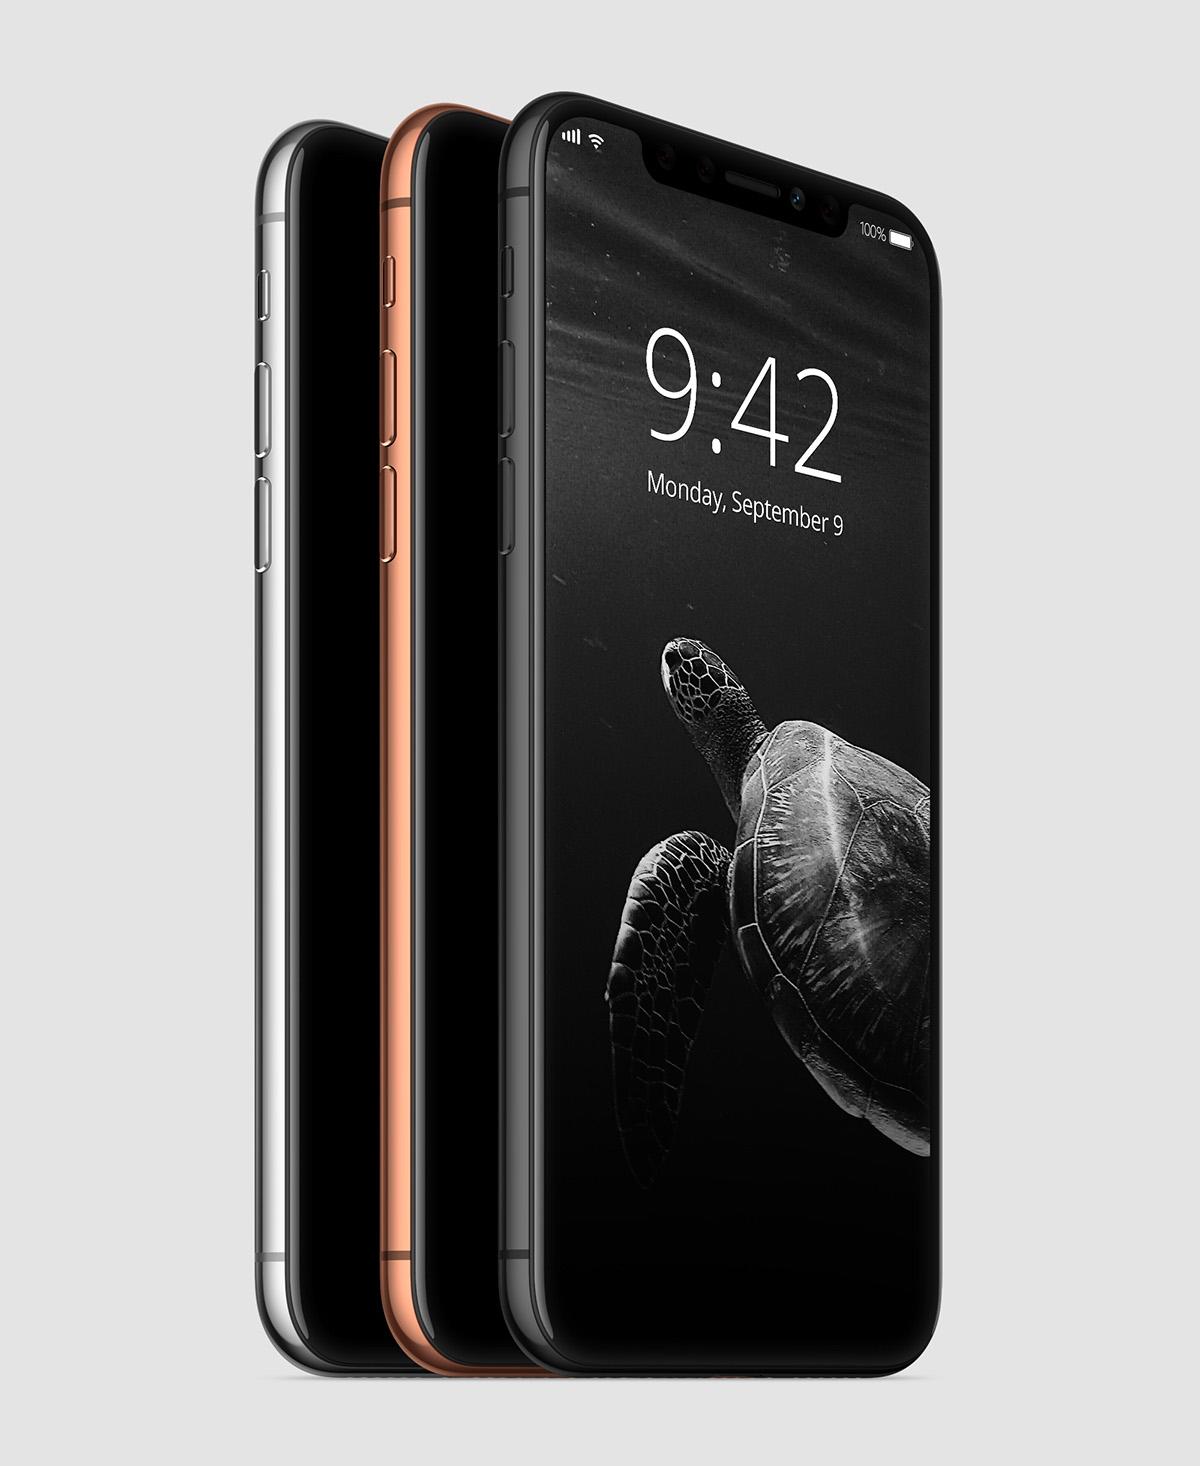 iPhone X、8、8 Plus SIMフリー版購入ガイド ドコモ、au、ソフトバンク、AppleStoreどこがお得?